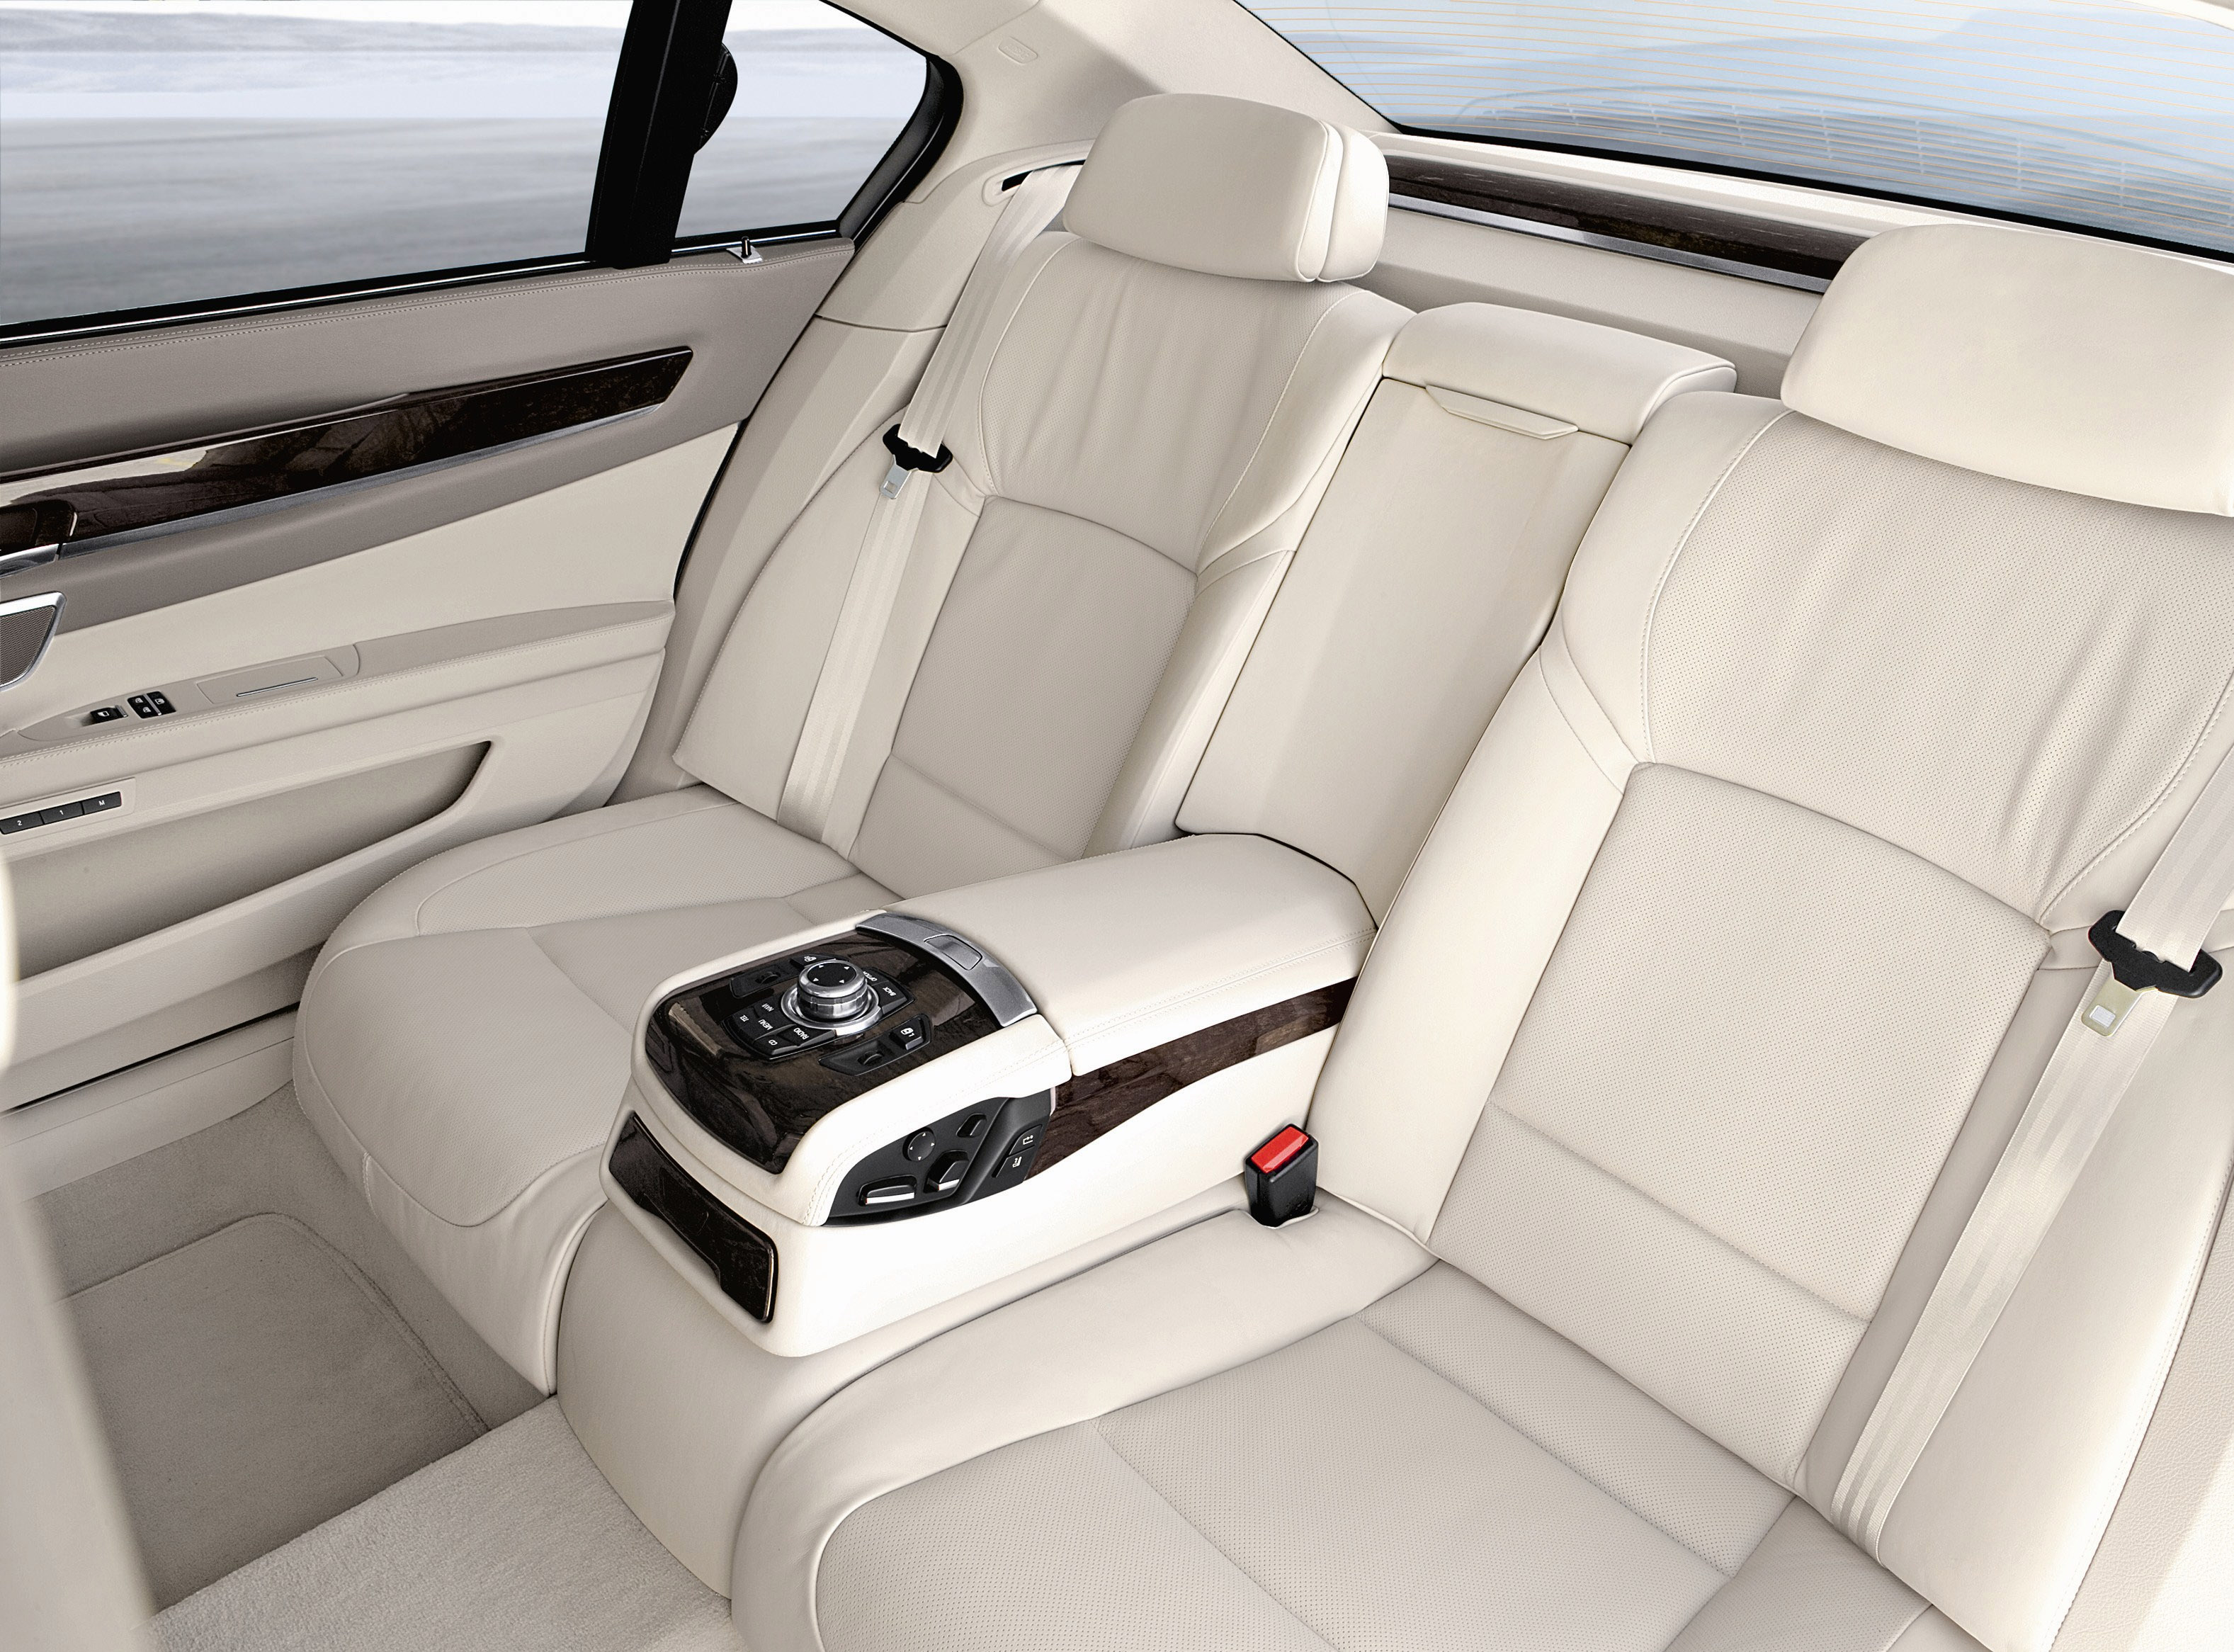 The New Bmw 7 Series Interior 03